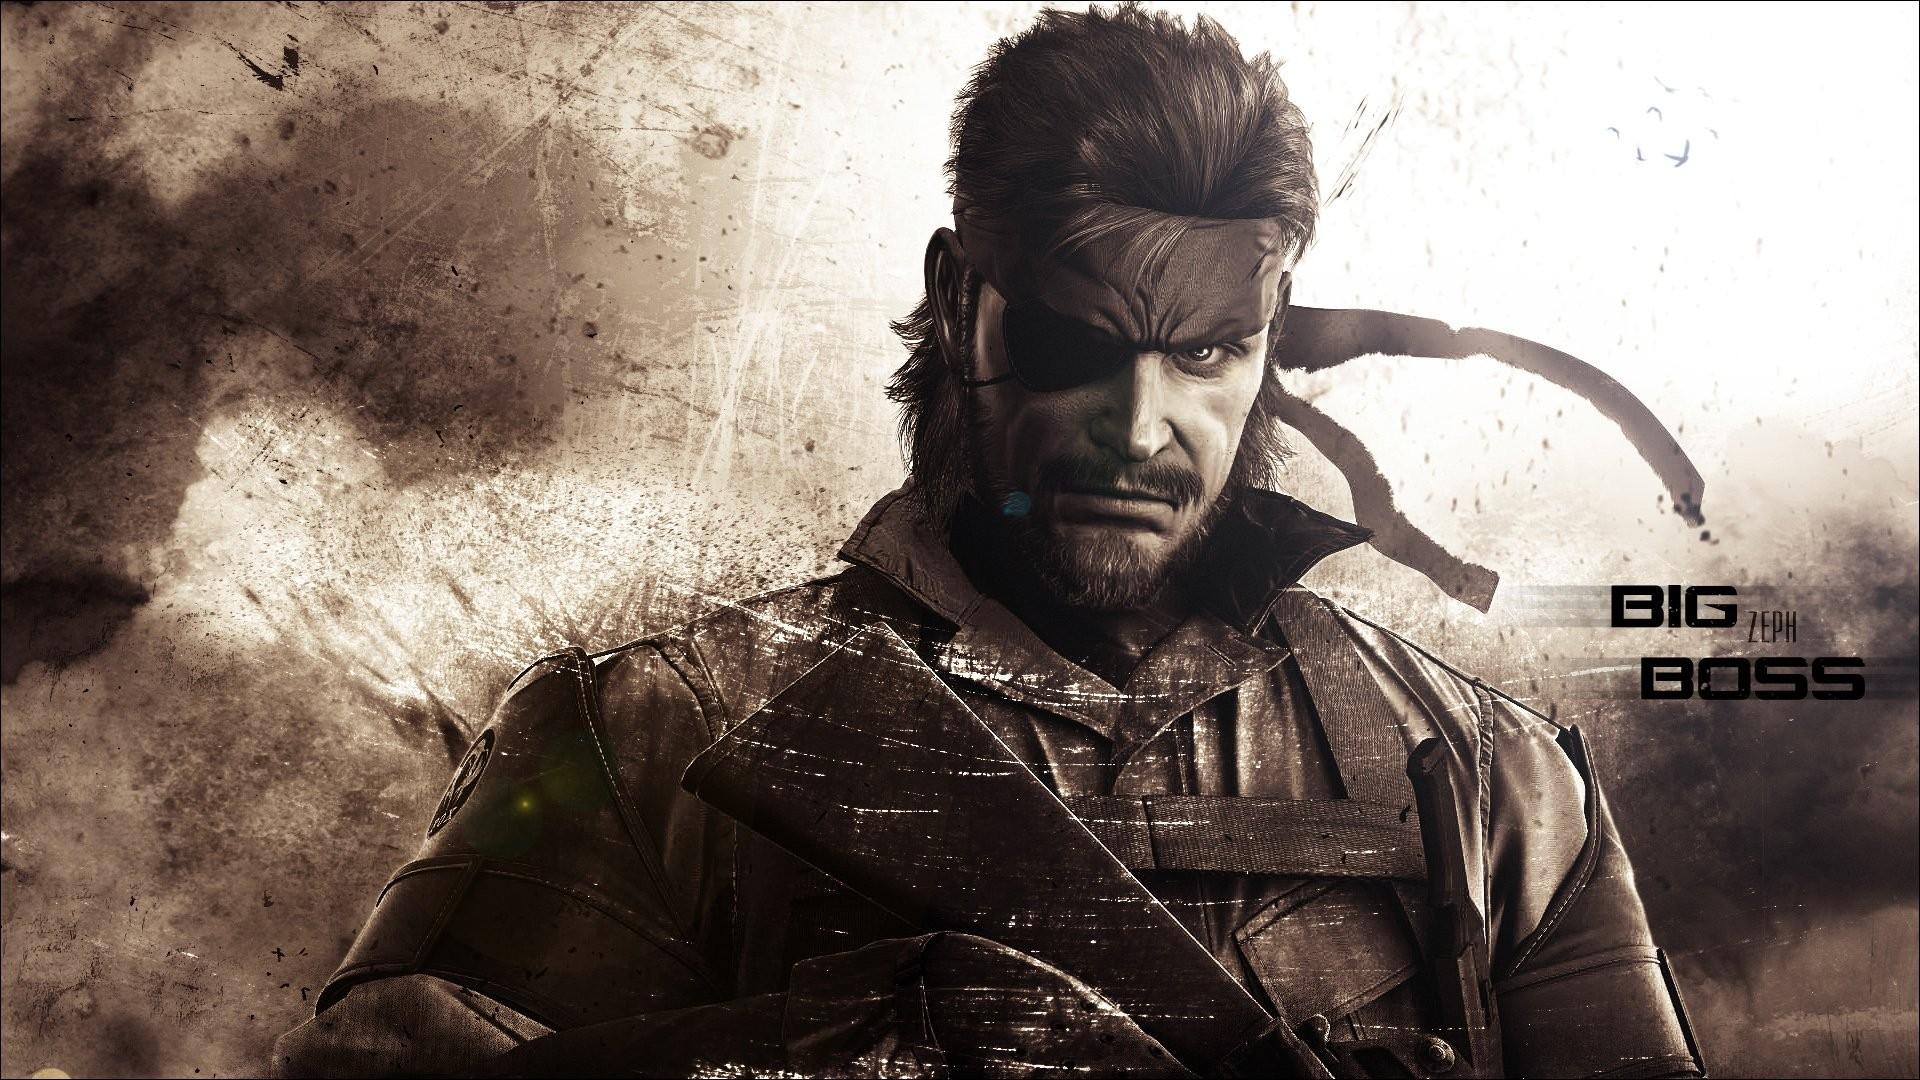 Fond Décran Jeux Vidéo Soldat Serpent Metal Gear Solid Metal